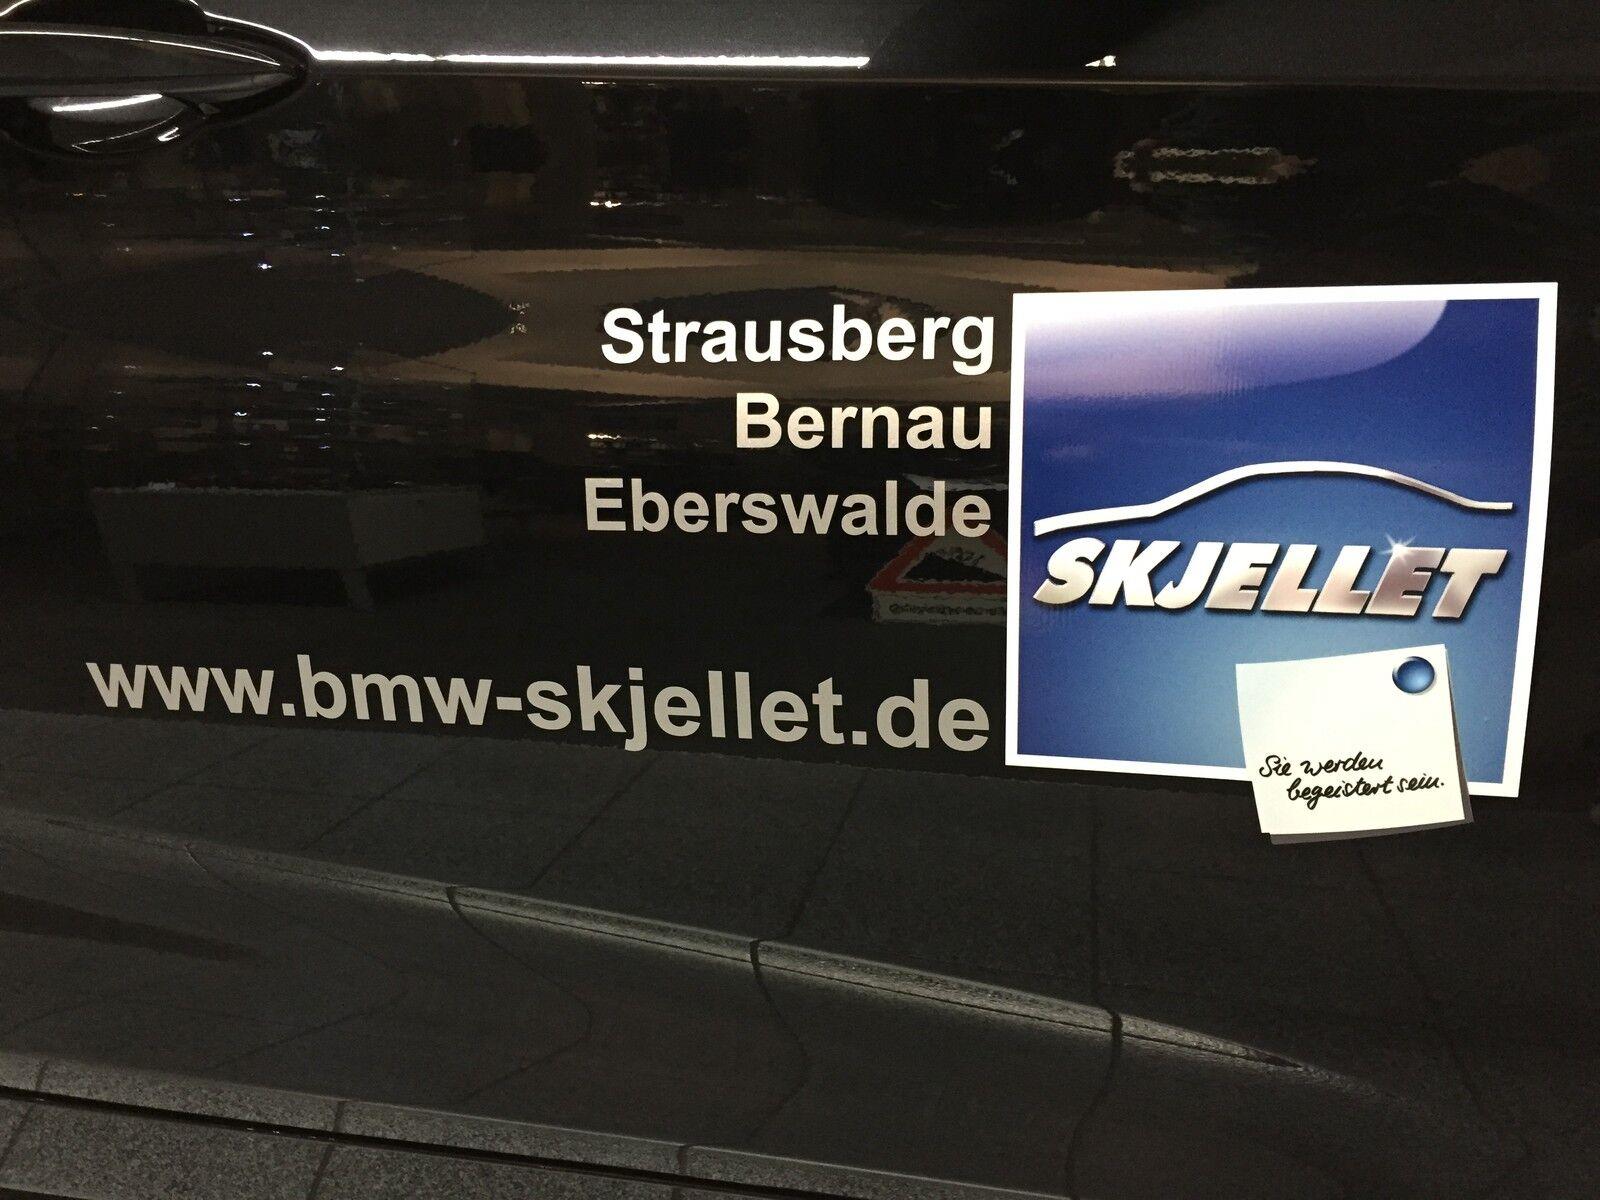 Shop BMW Skjellet